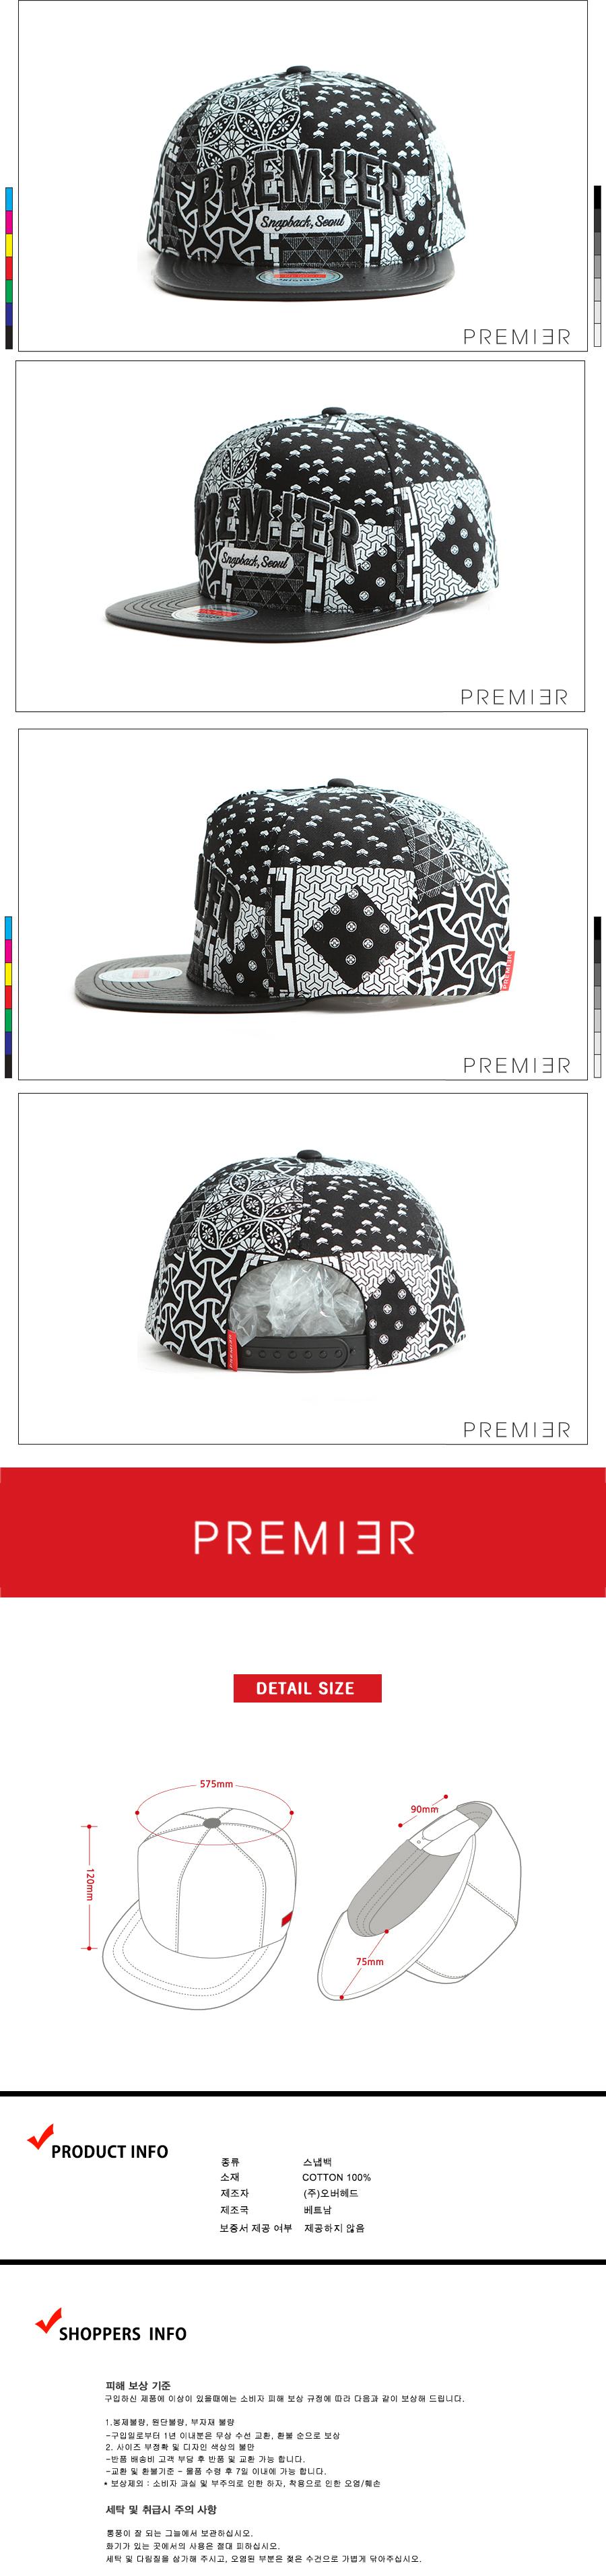 [ PREMIER ] [Premier] Snapback Chain Pattern Black/White (P914)